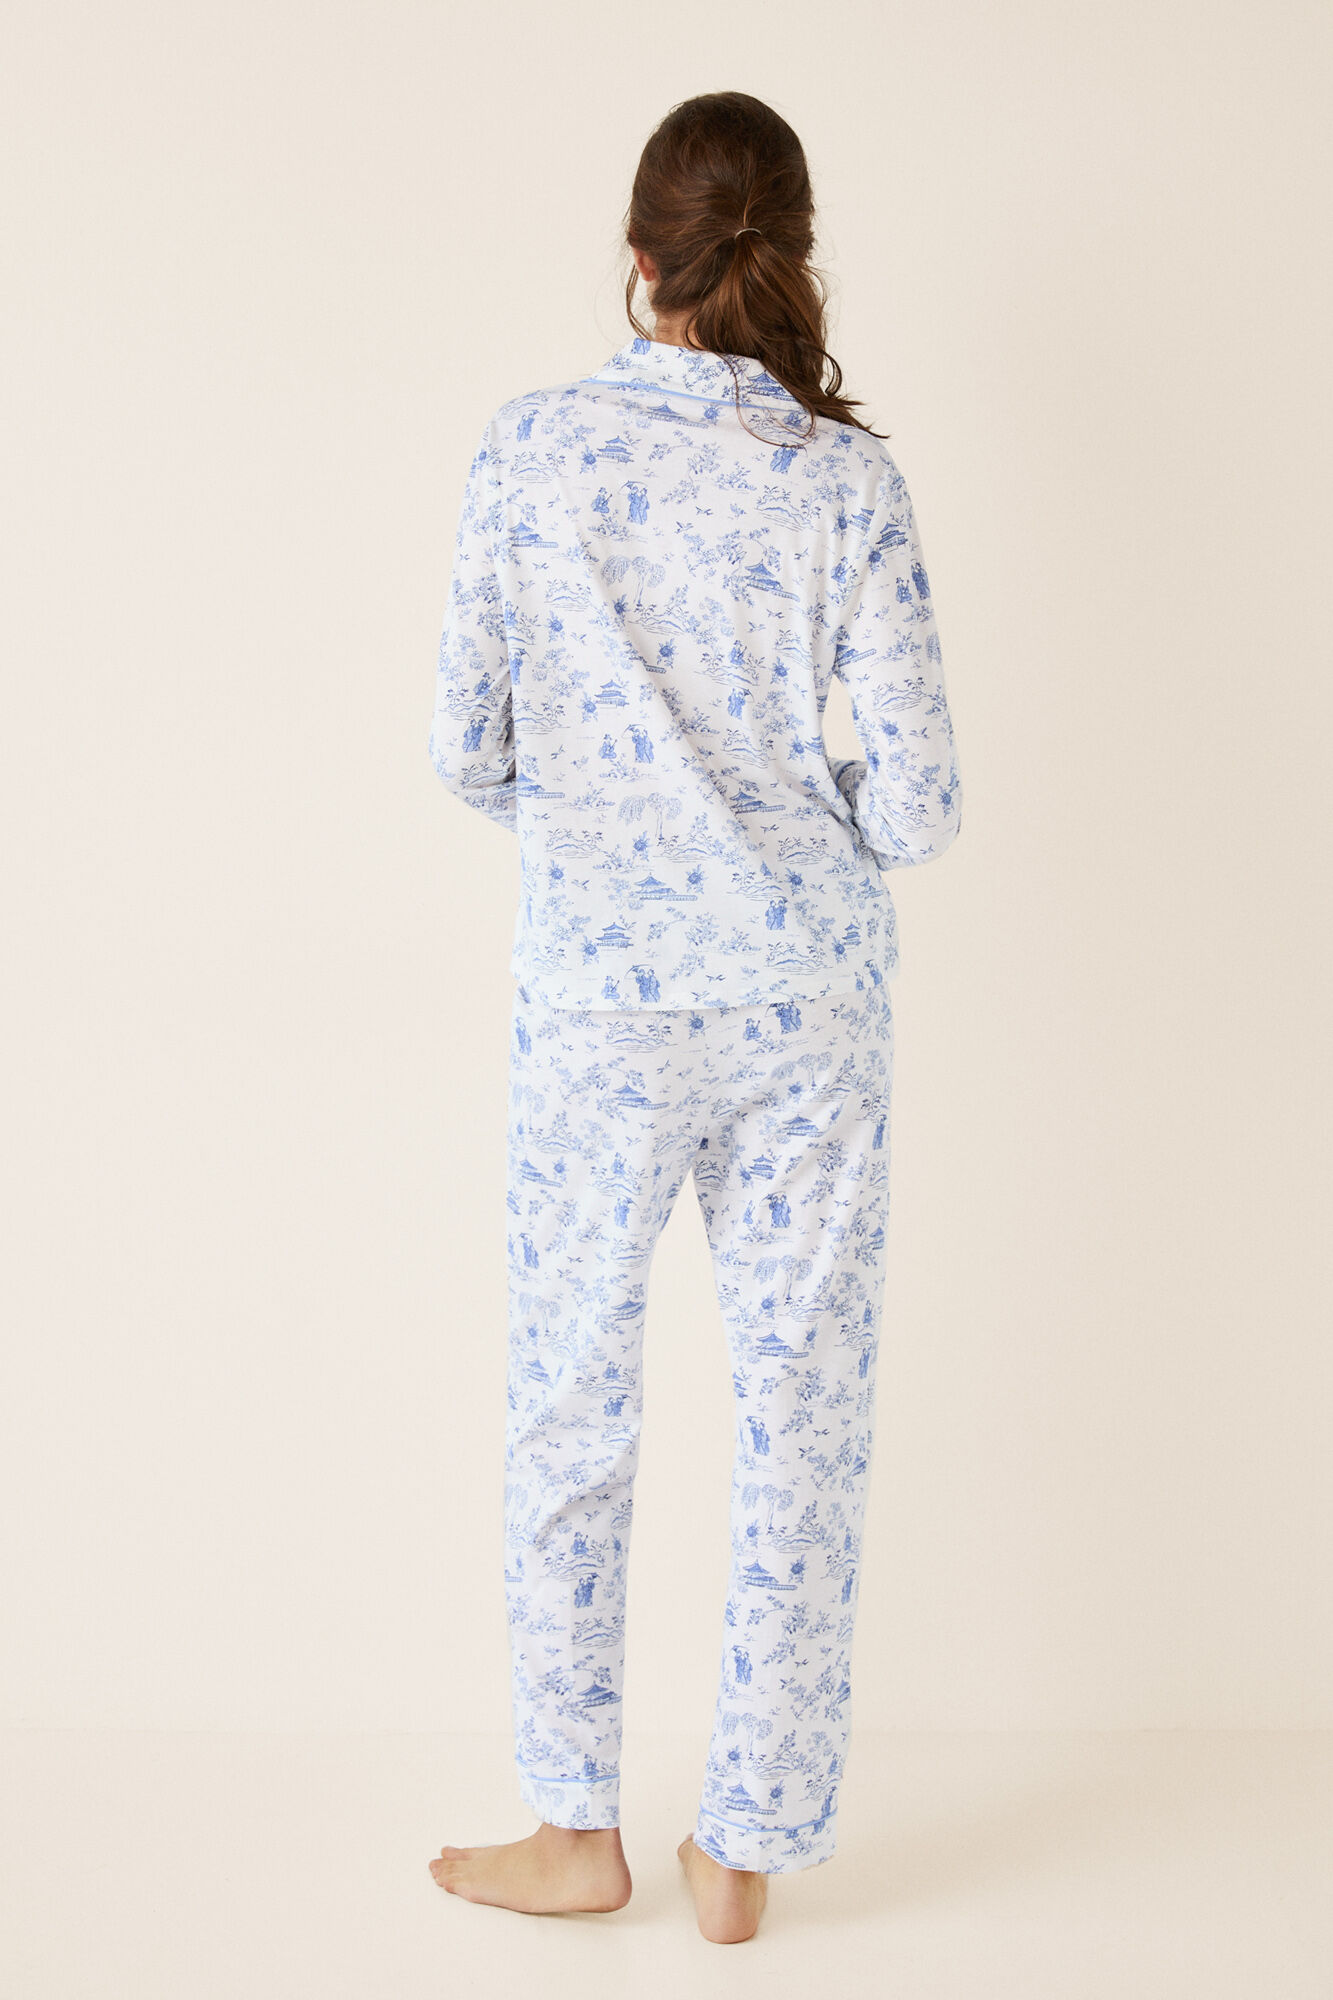 a72b5253f Pijama camisero largo oriental